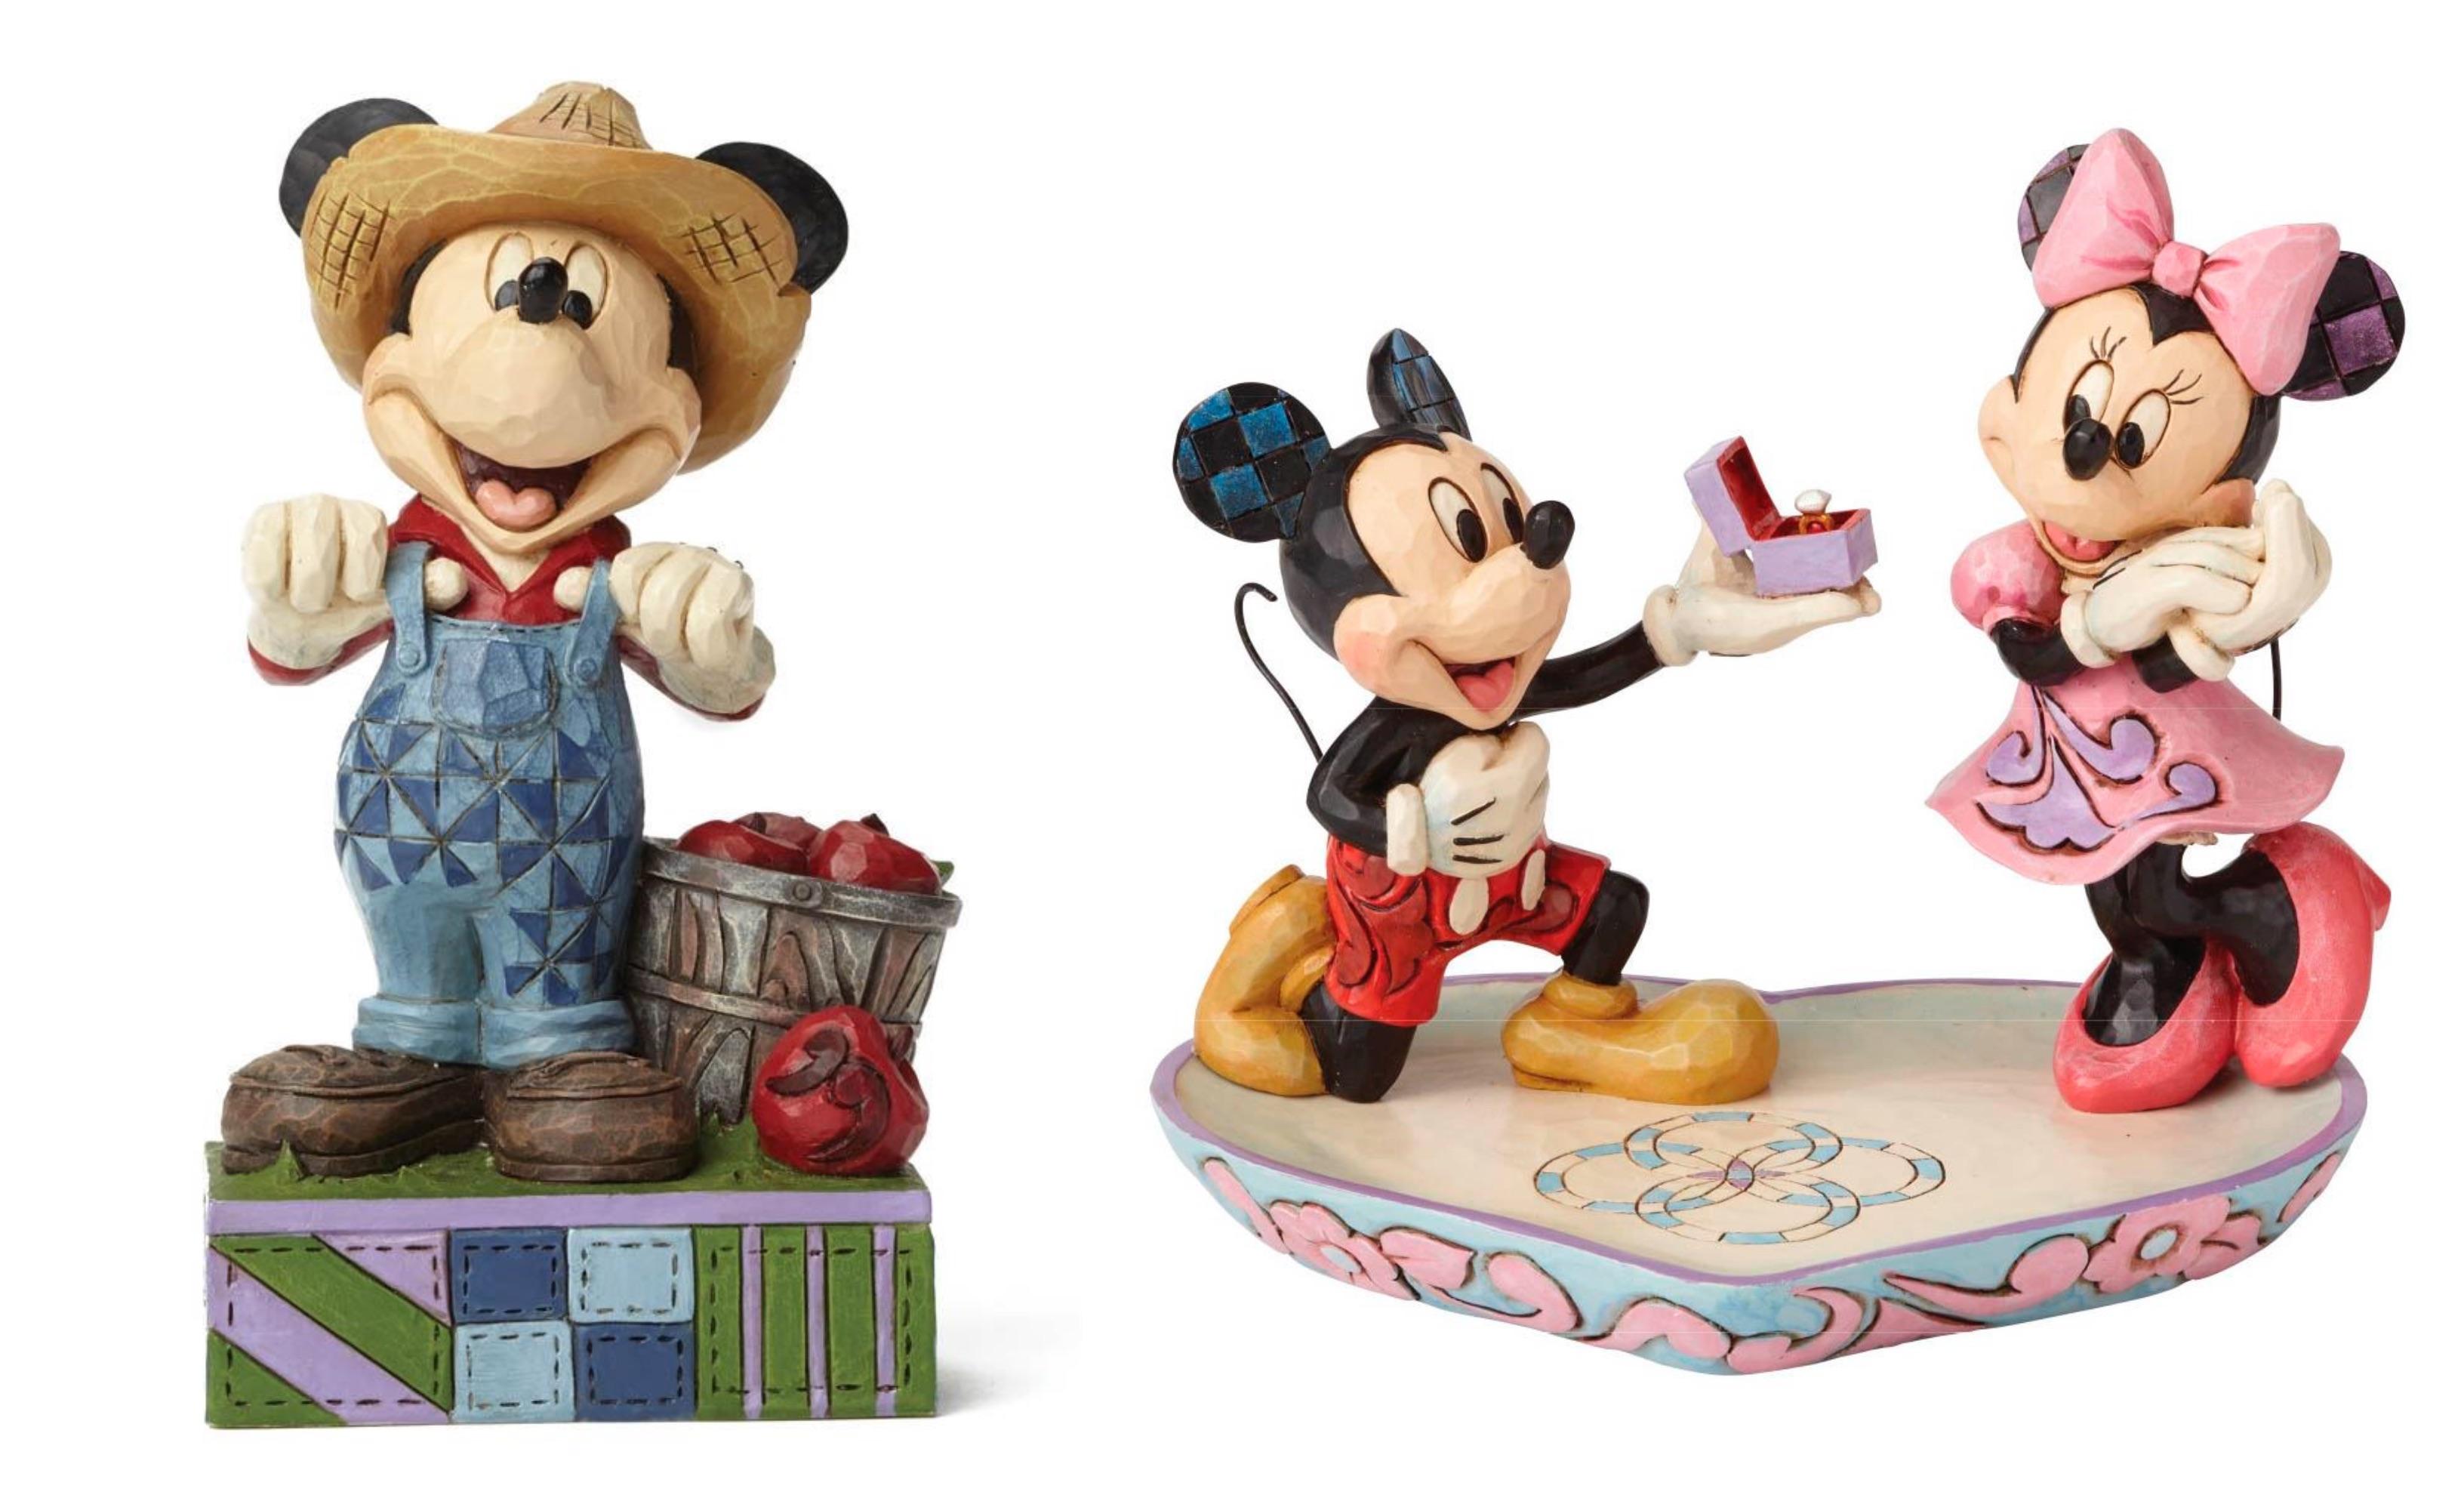 jim Shore - Mickey Mouse figurer, jim shore disney figurer, jim shore mickey mouse figur, jim shore figurer, jim shore disney figurer tilbud, Mickey mouse gaver, mickey mouse samlerobjekter, gave til mickey mouse fan